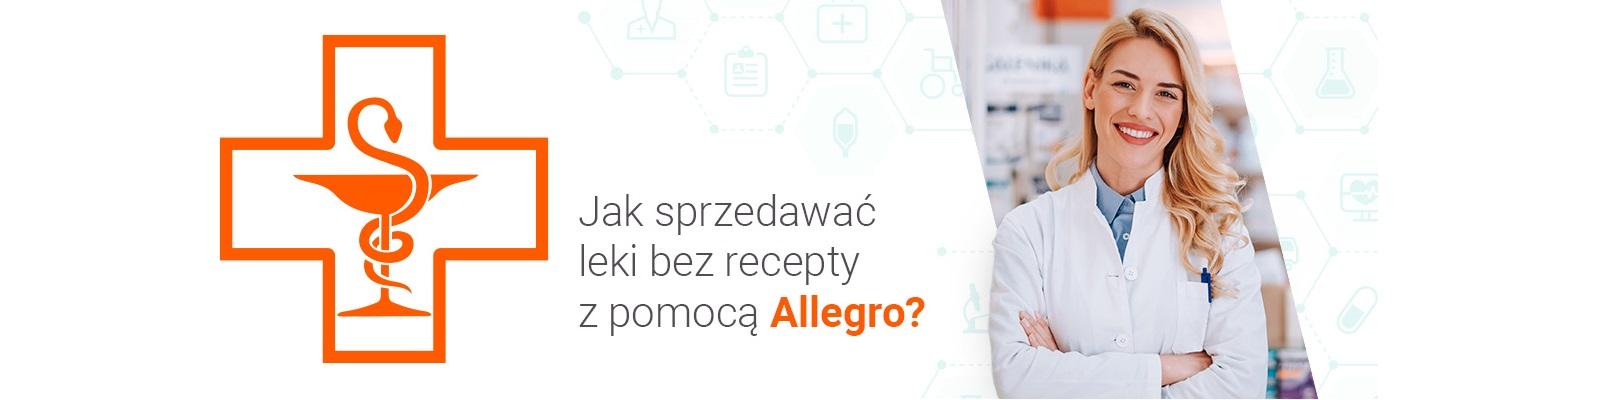 Konto Apteczne Na Allegro